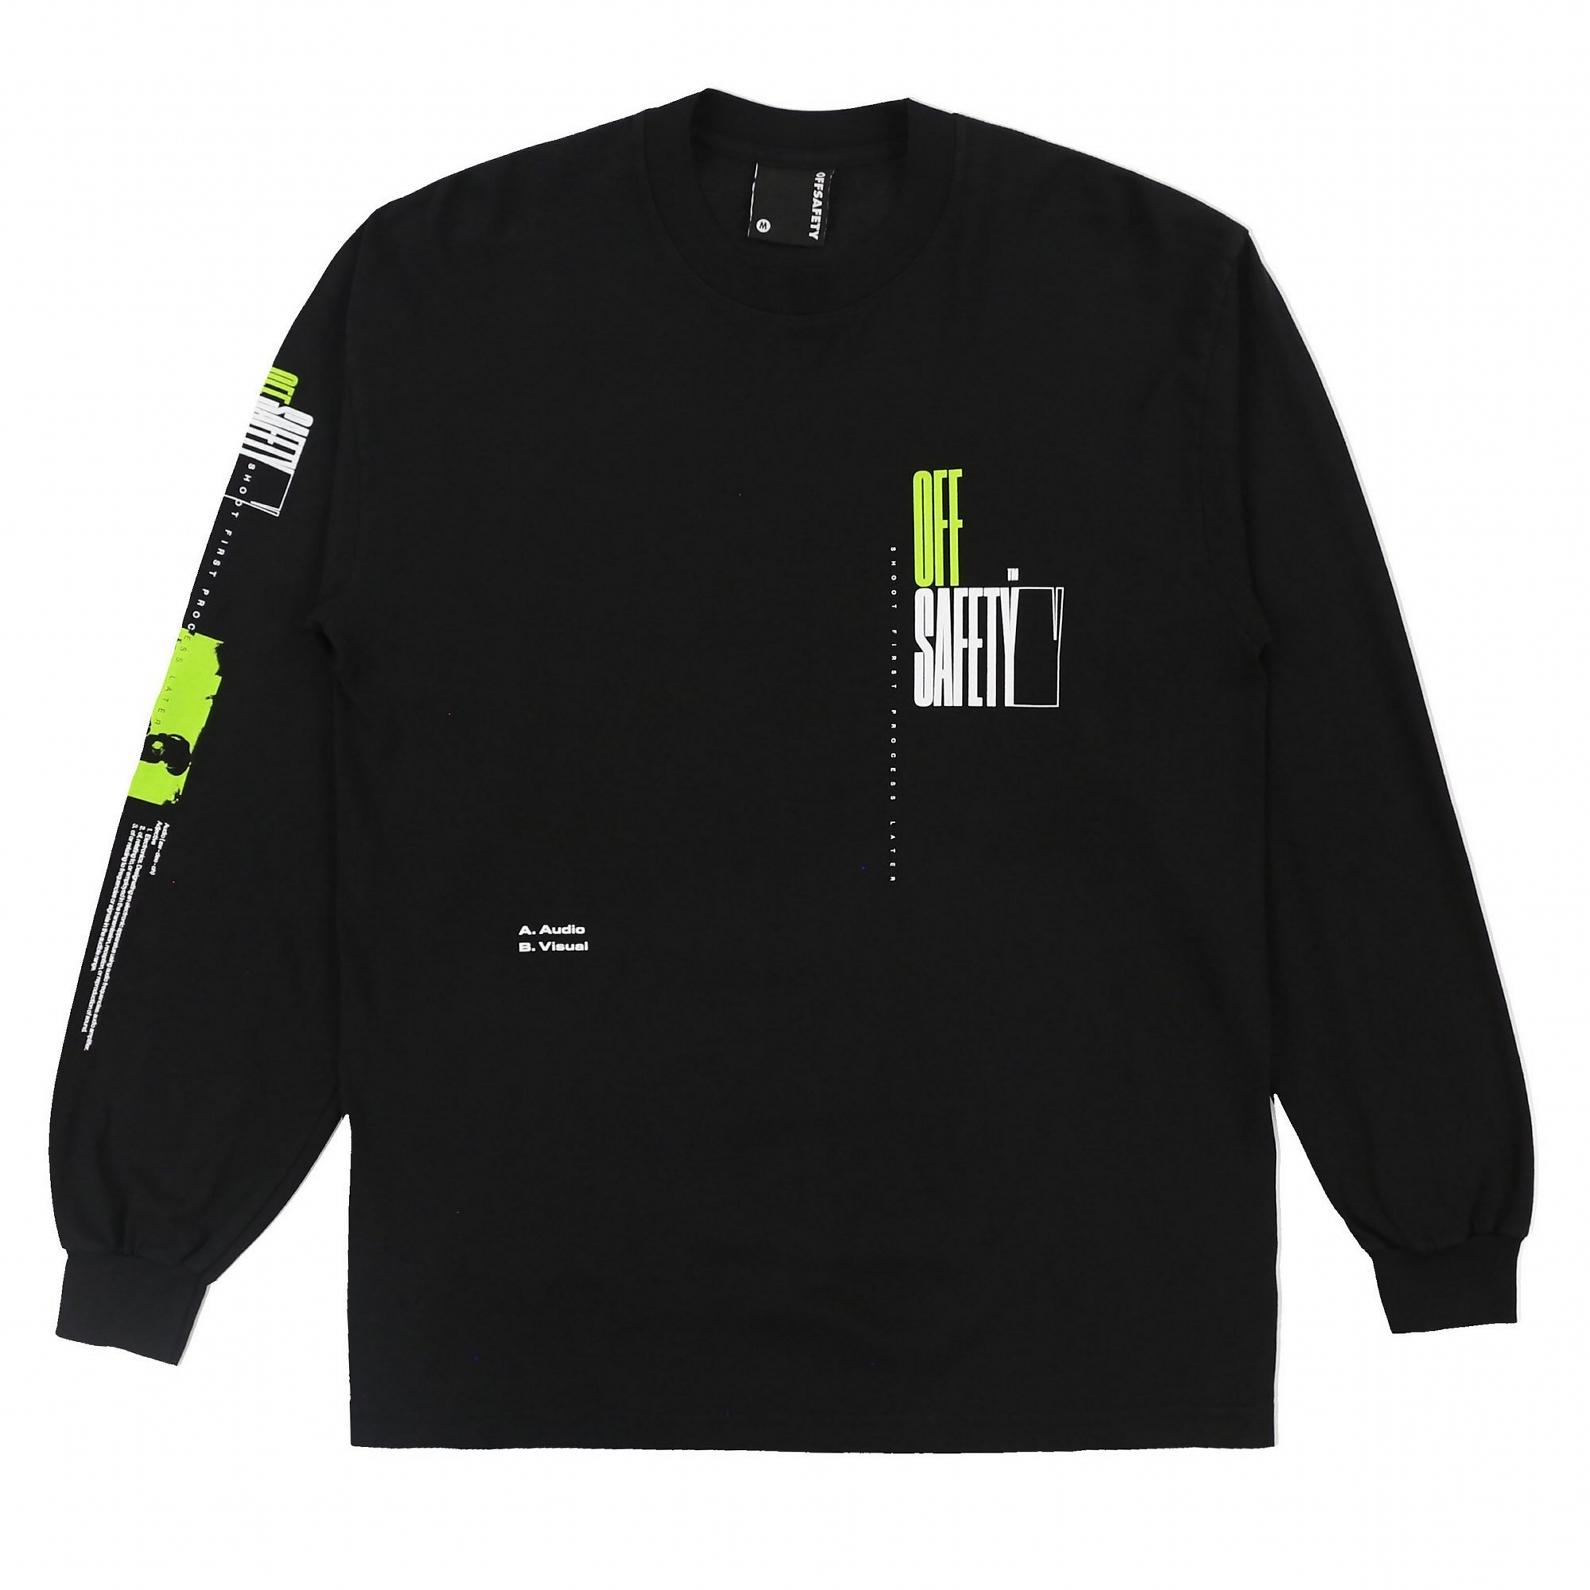 【OFF SAFETY/オフセーフティー】SKY'S THE LIMIT LS TEE 長袖Tシャツ / BLACK